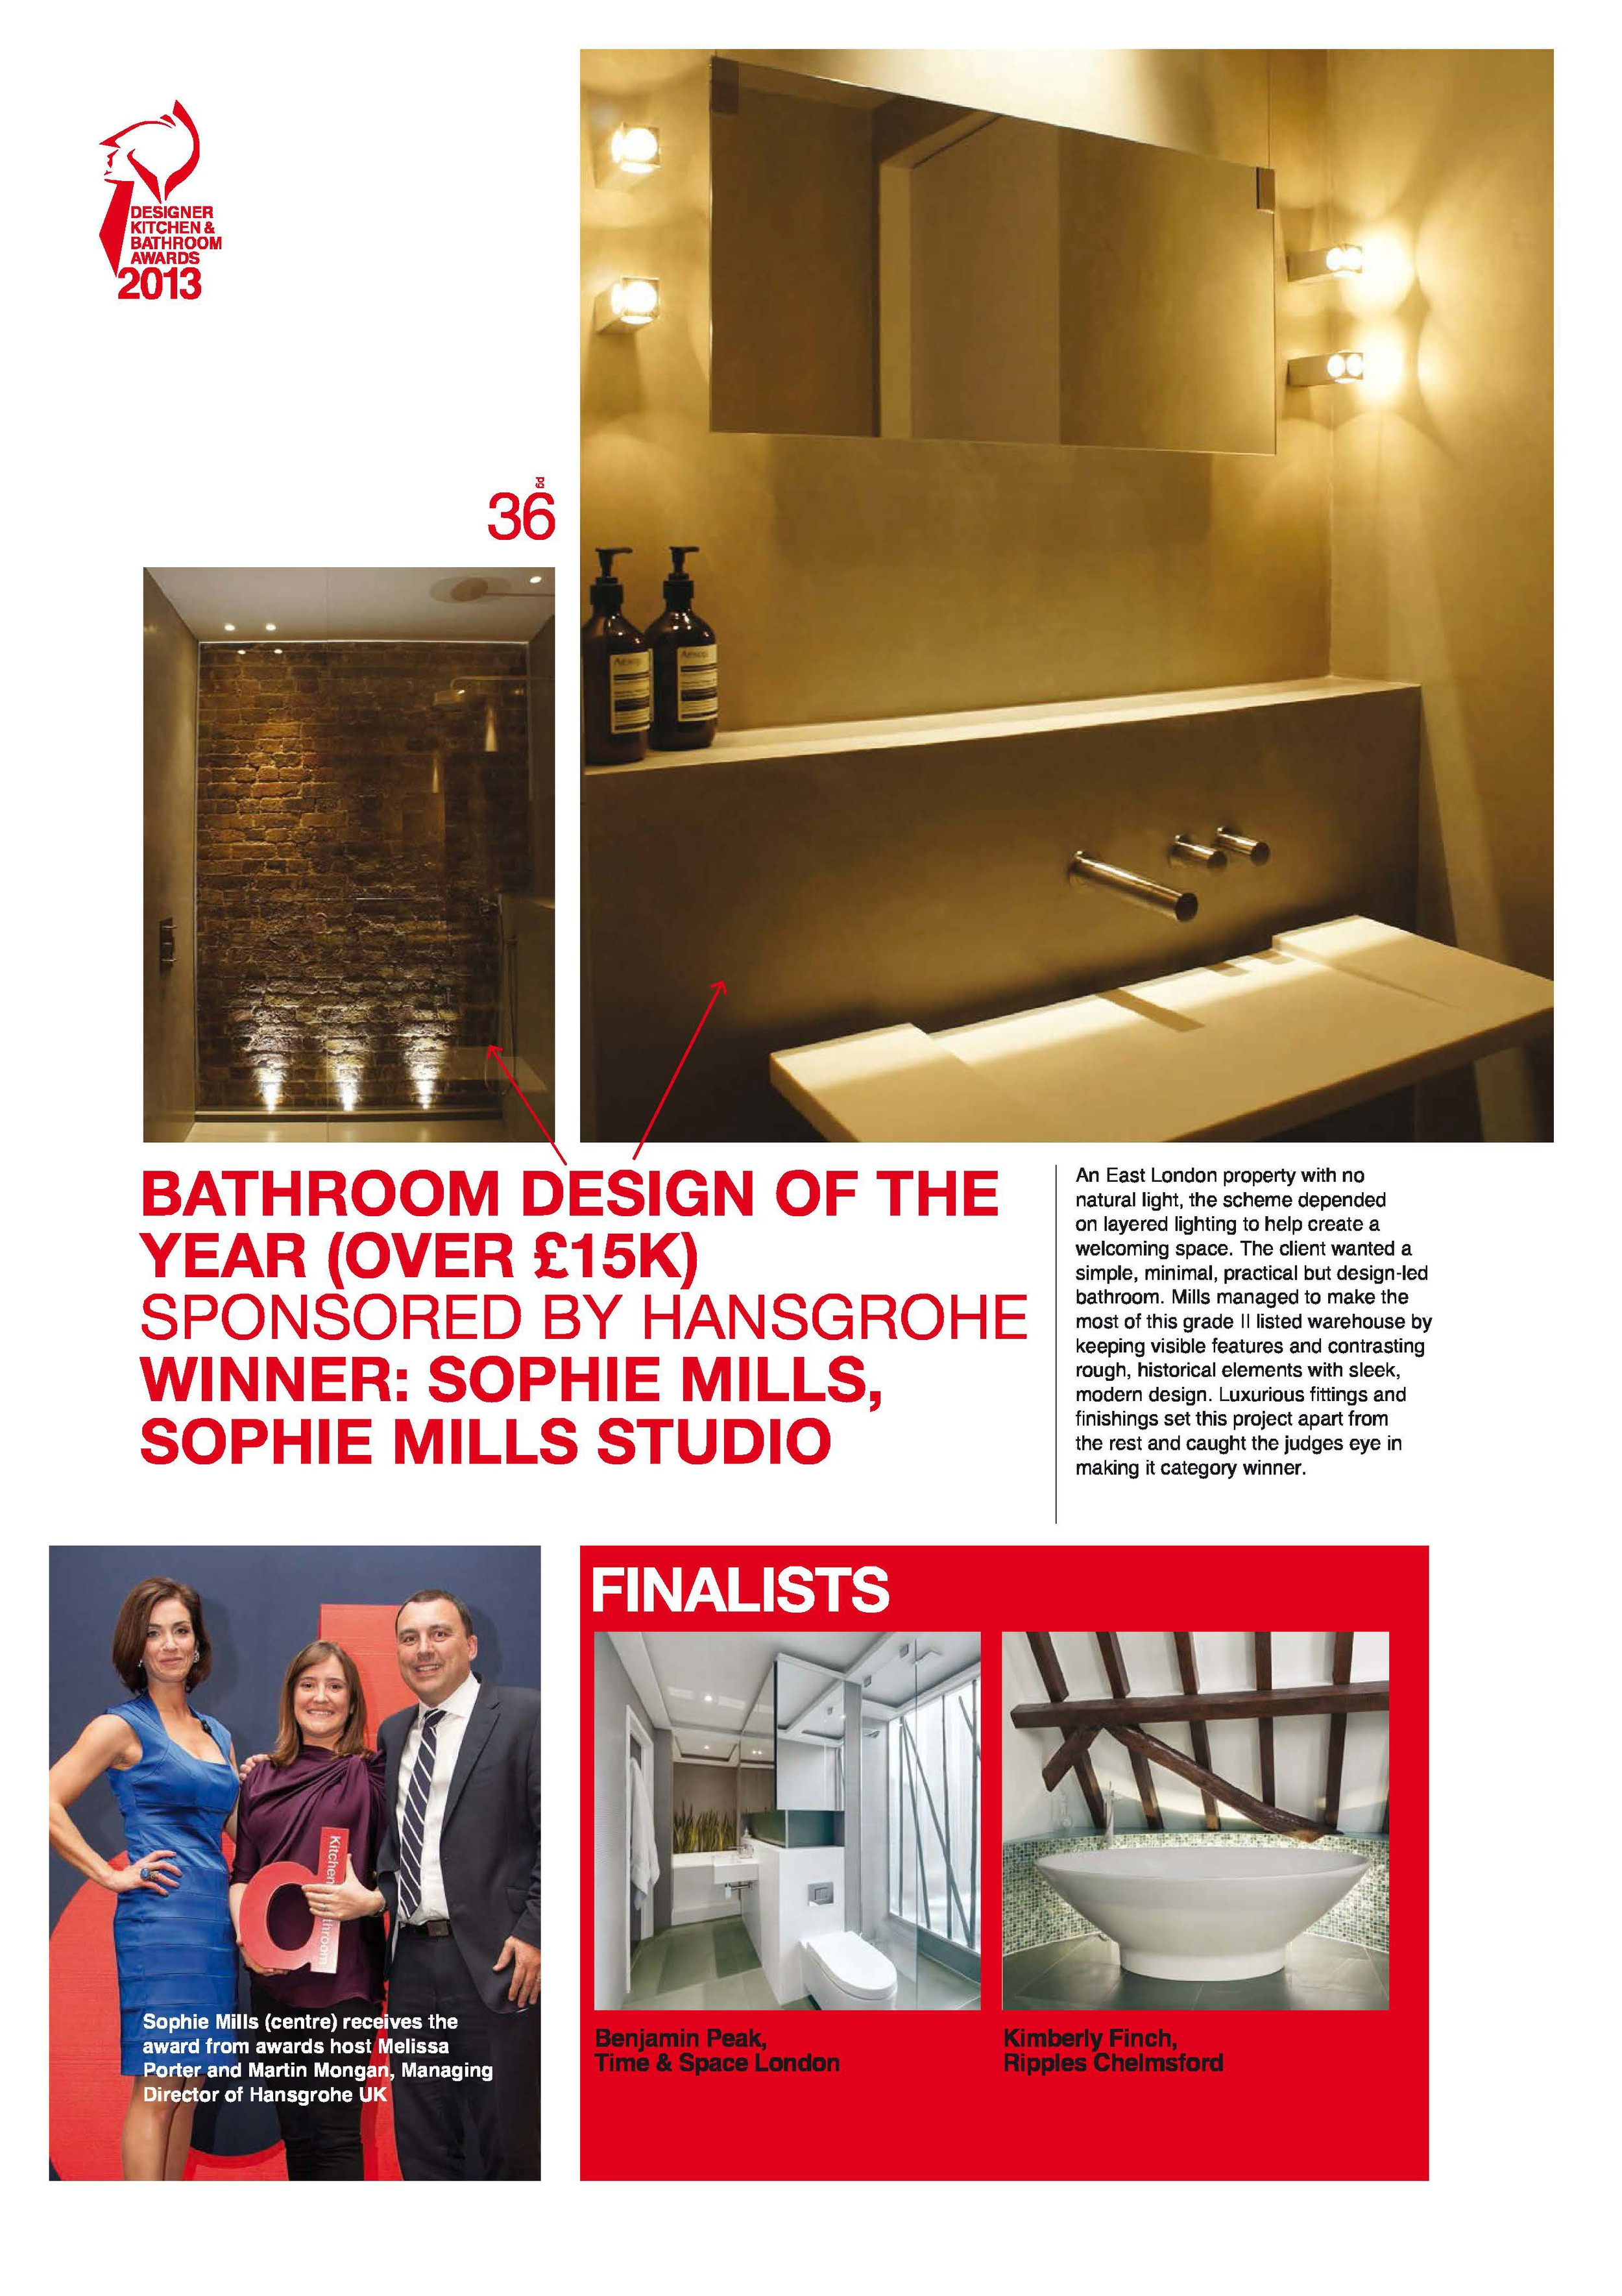 Bathroom Design of the Year.jpg